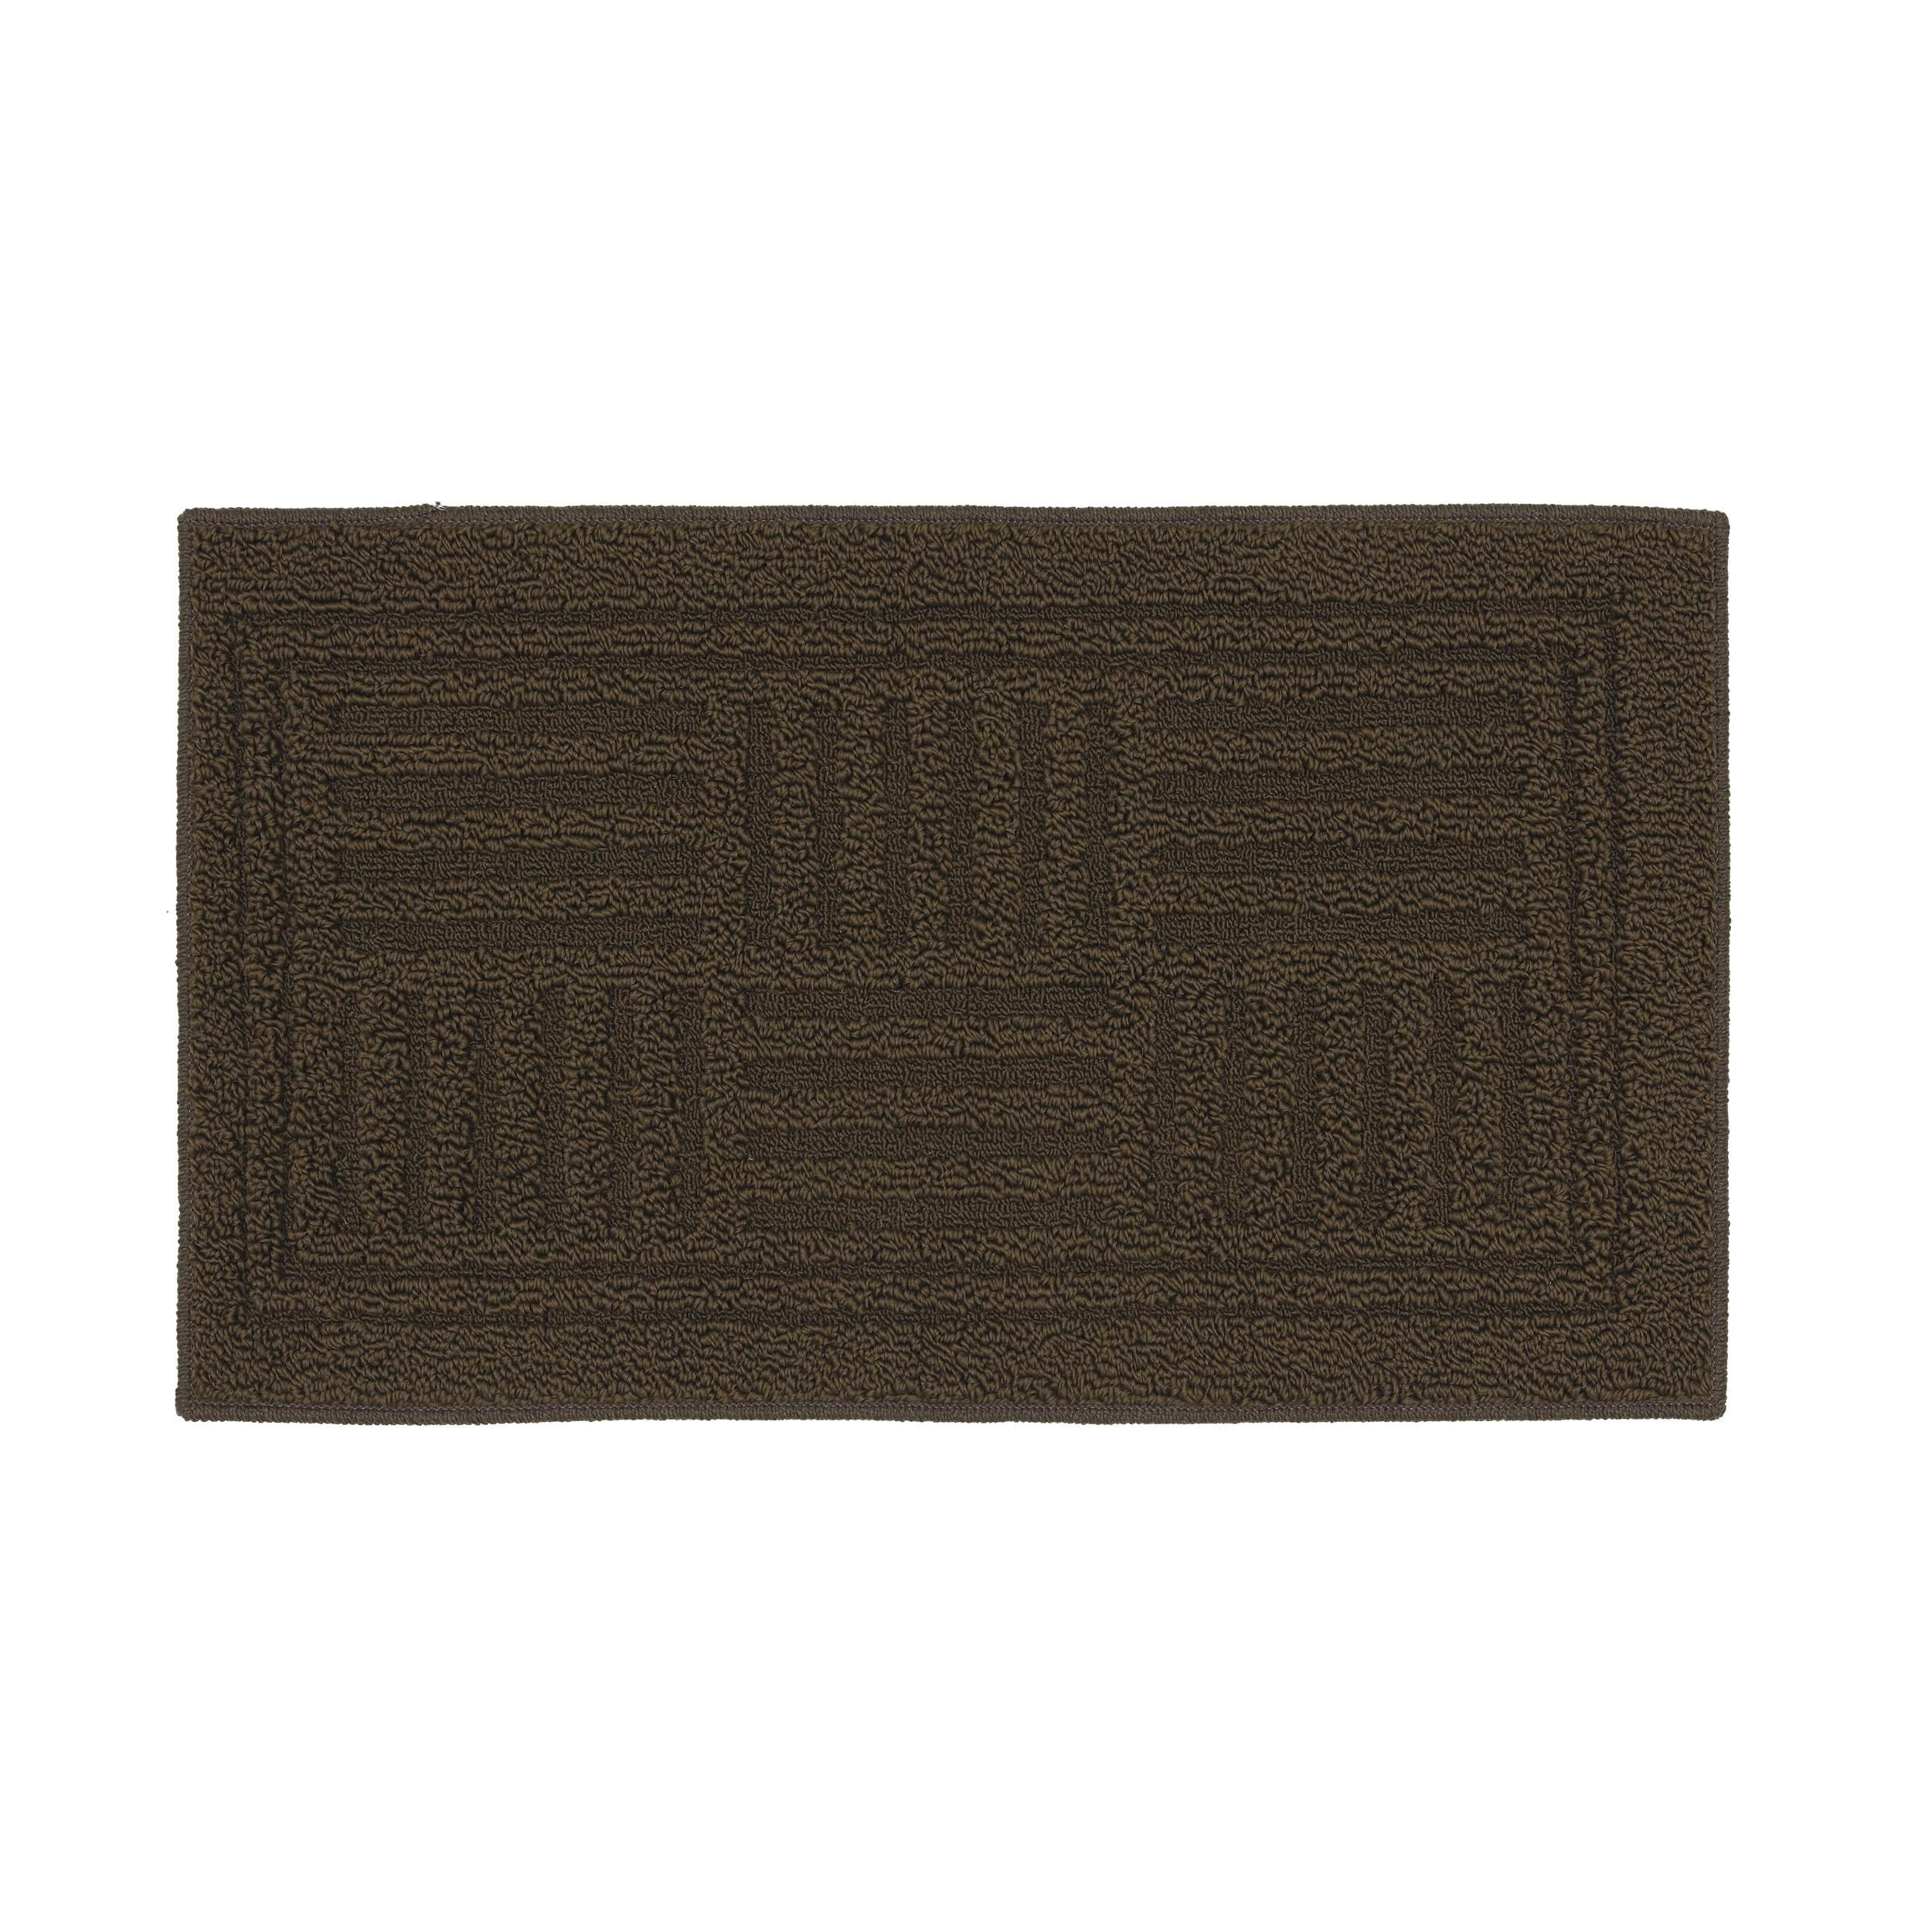 Grid Iron Mink Dark Taupe Solid Rug (2'3 x 3'9)